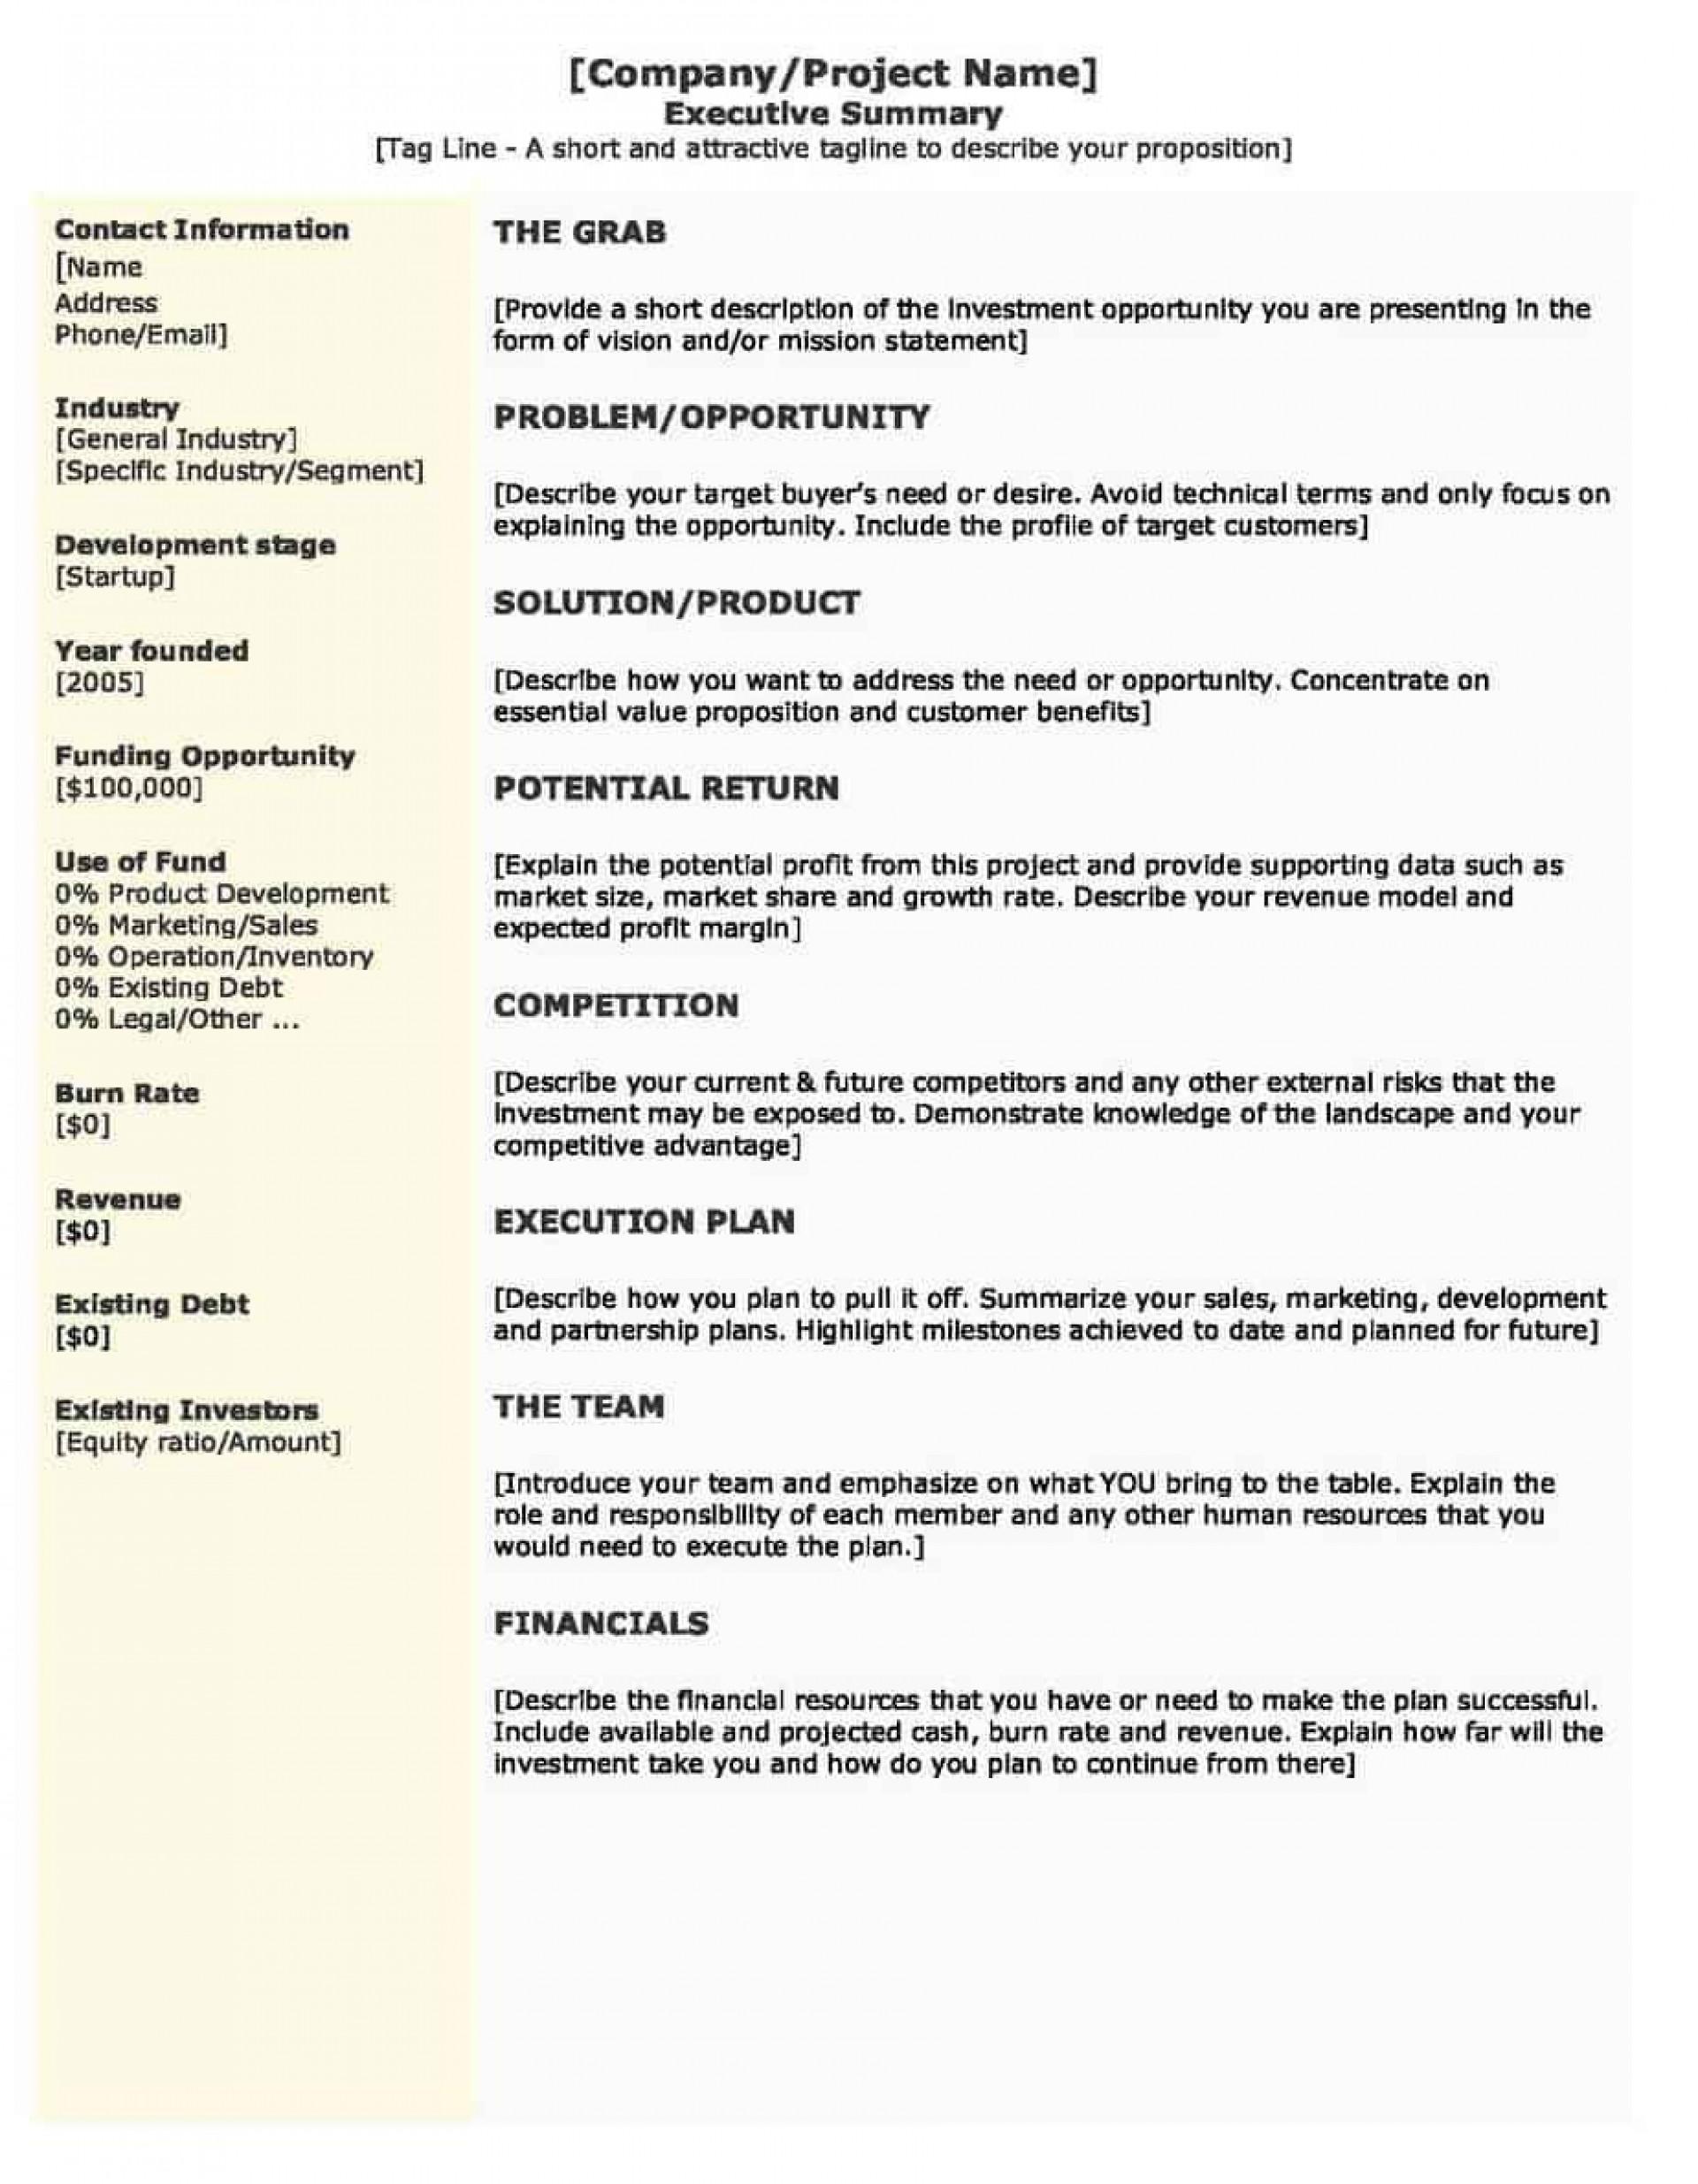 002 Simple Executive Summary Template Doc Photo  Document Example Google1920